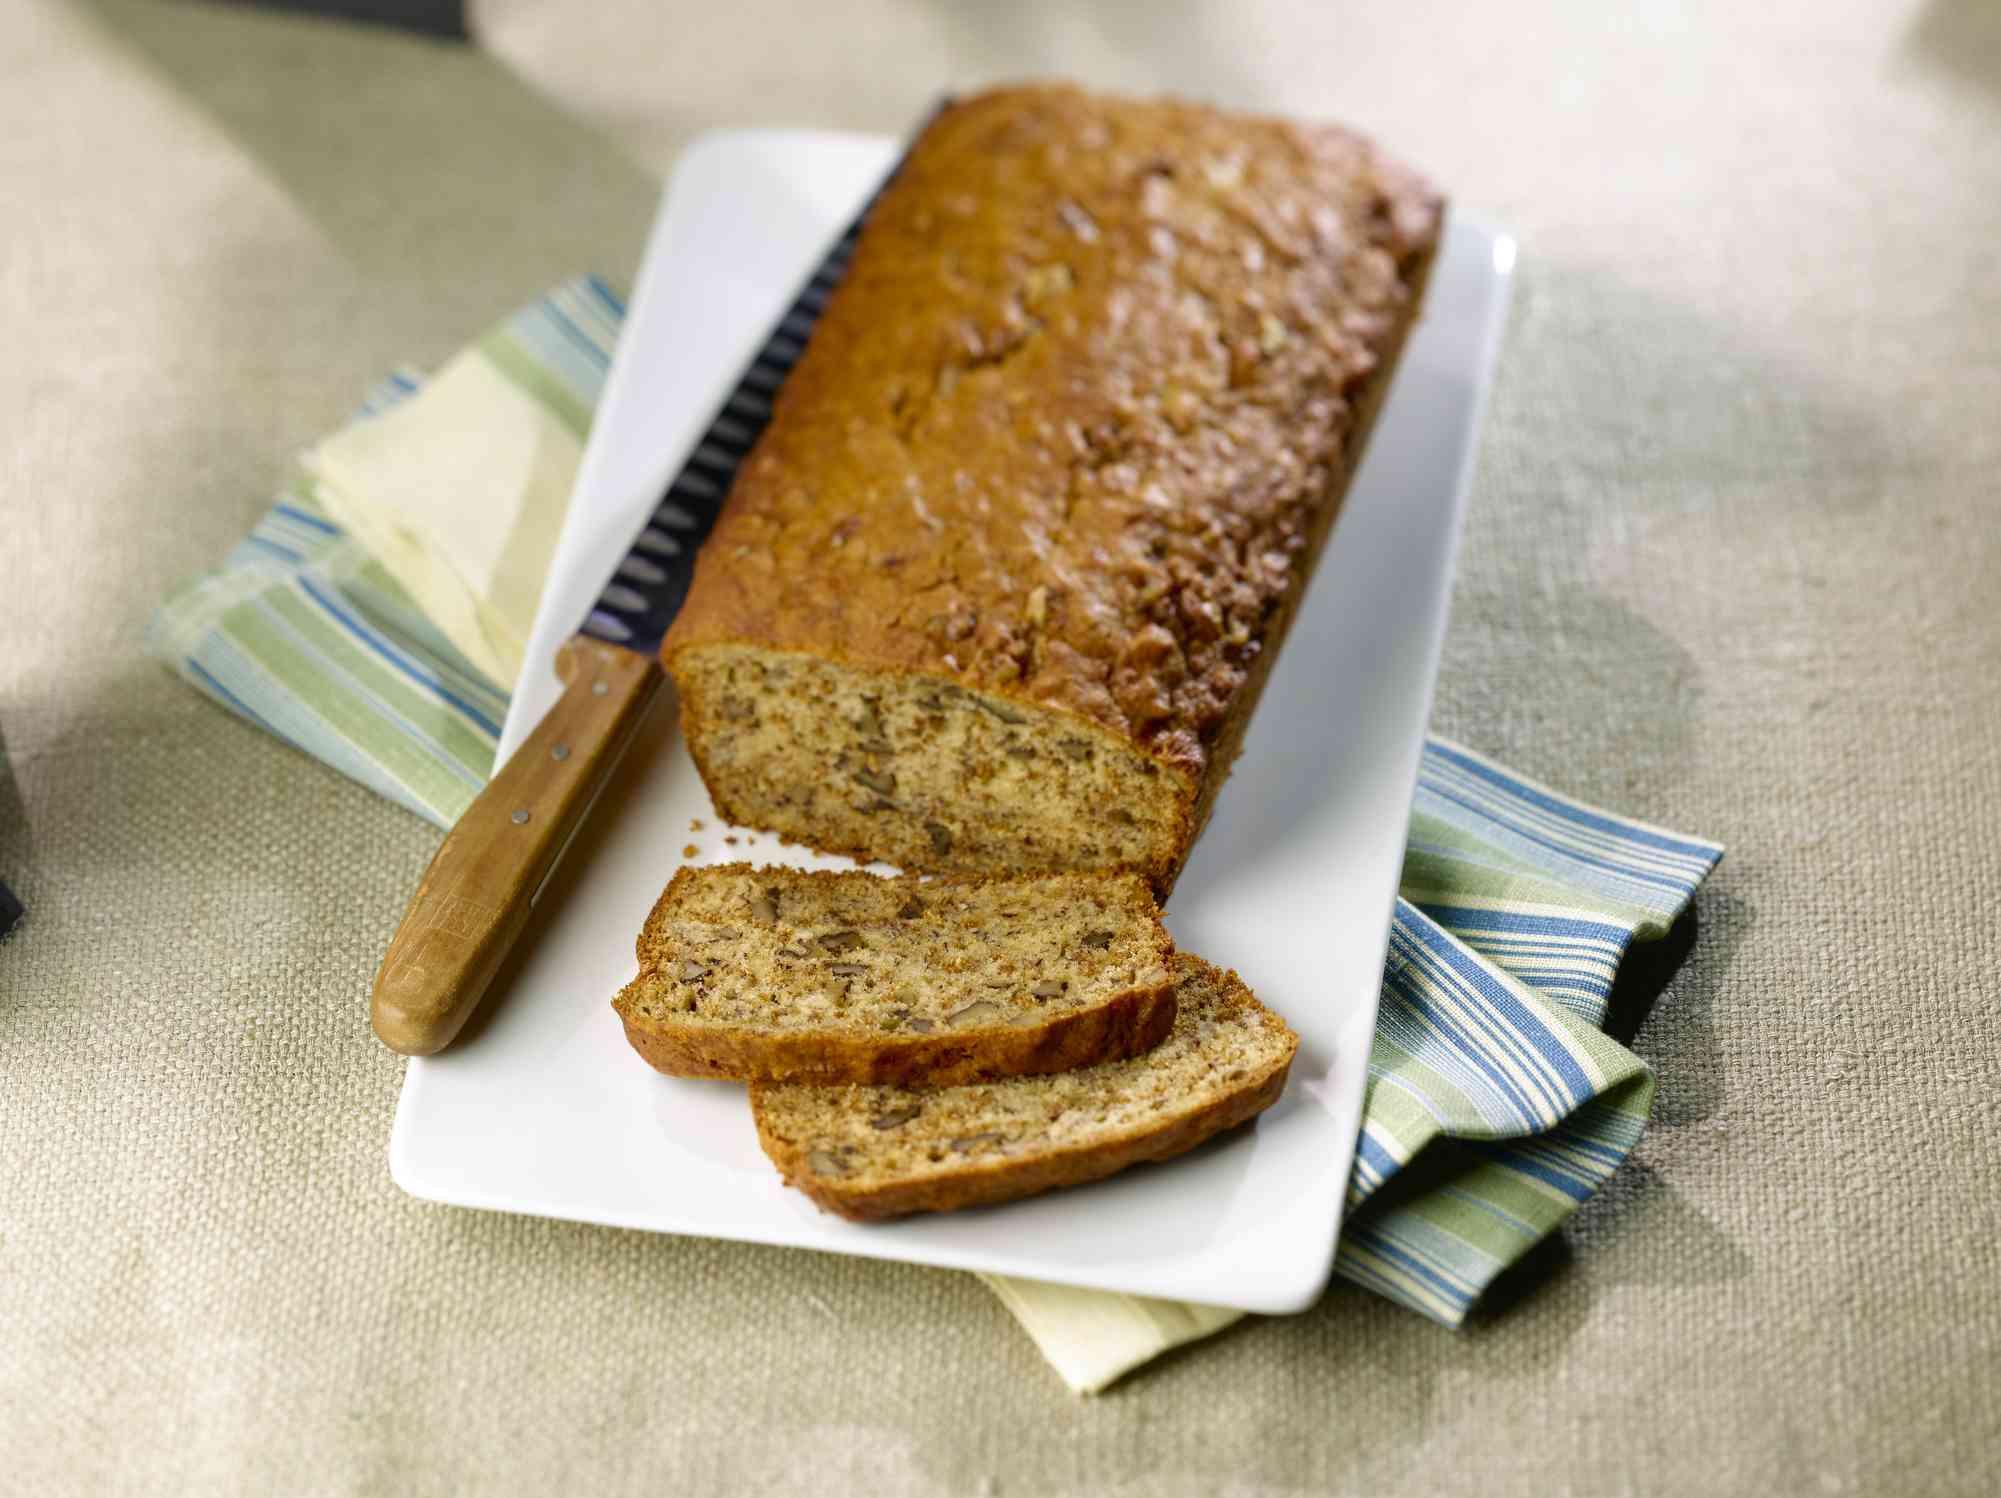 Gluten free banana bread